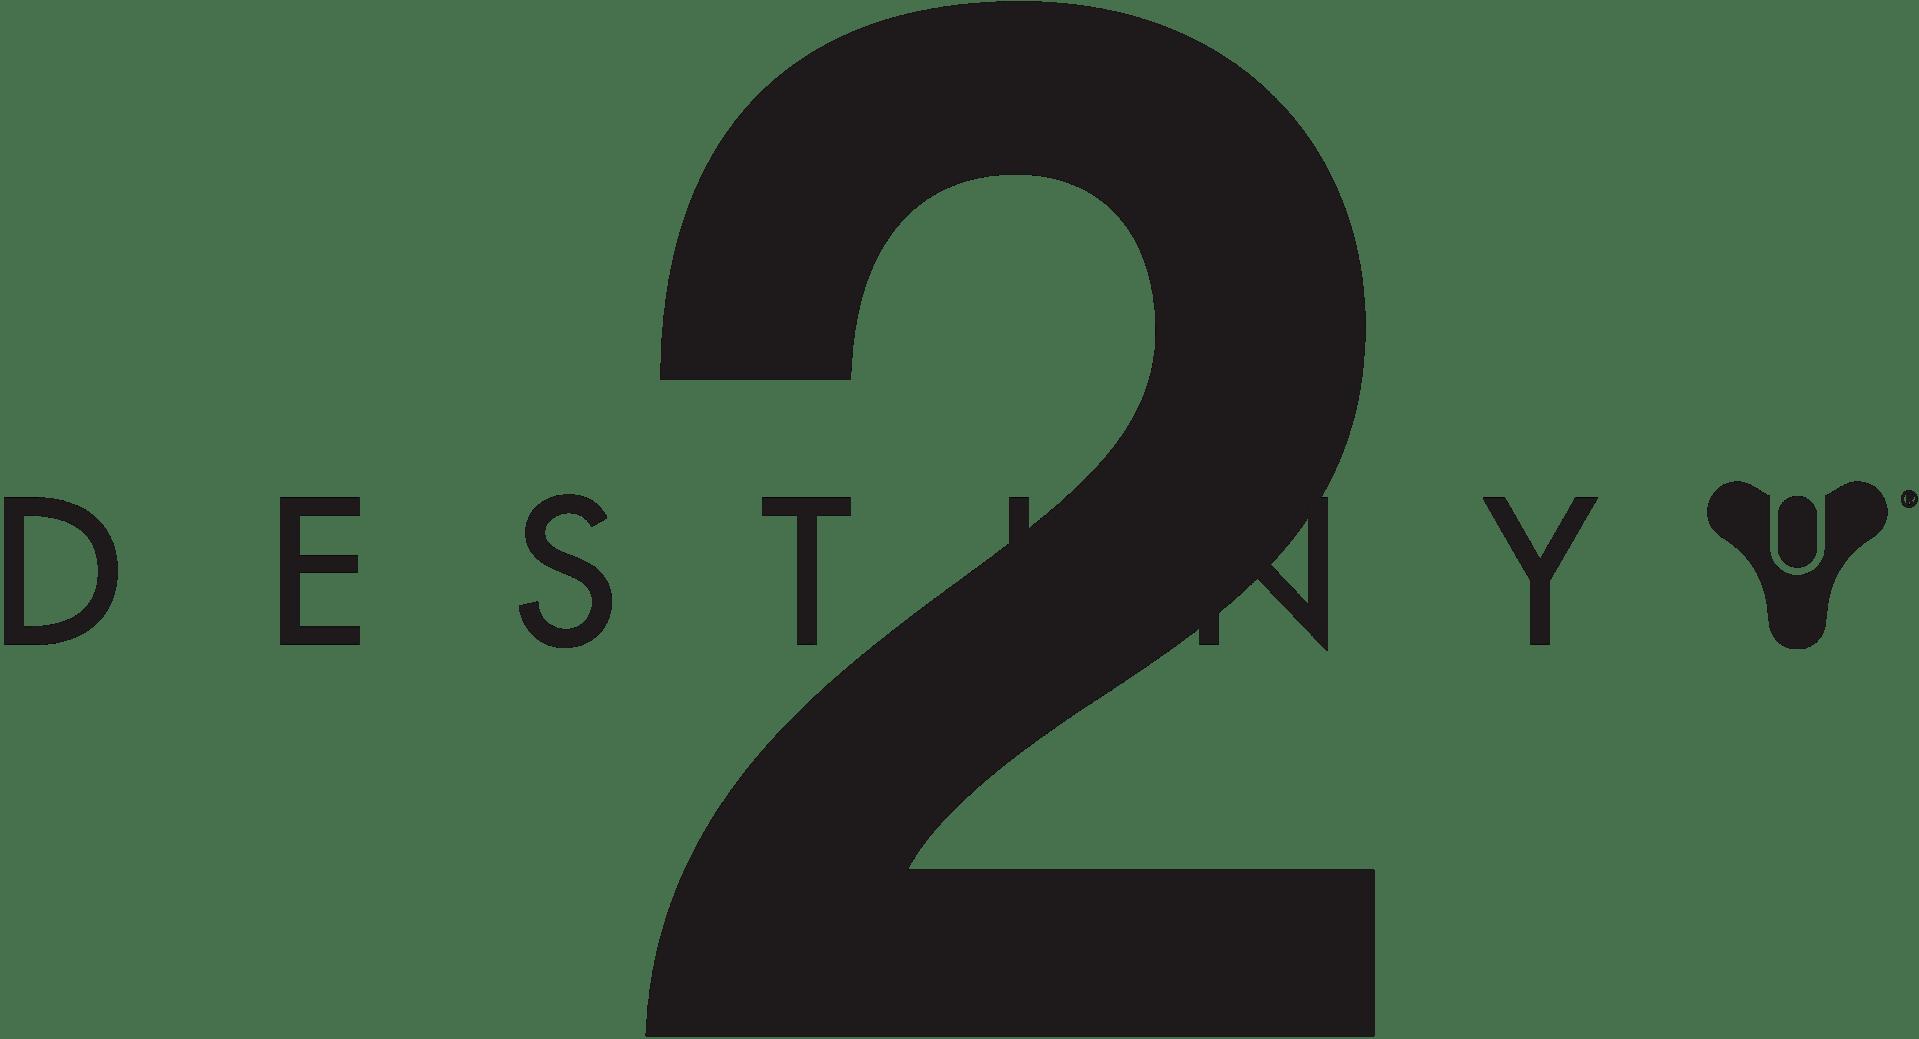 Destiny Logo Png Destiny 2 Transparent Images Free Download Free Transparent Png Logos